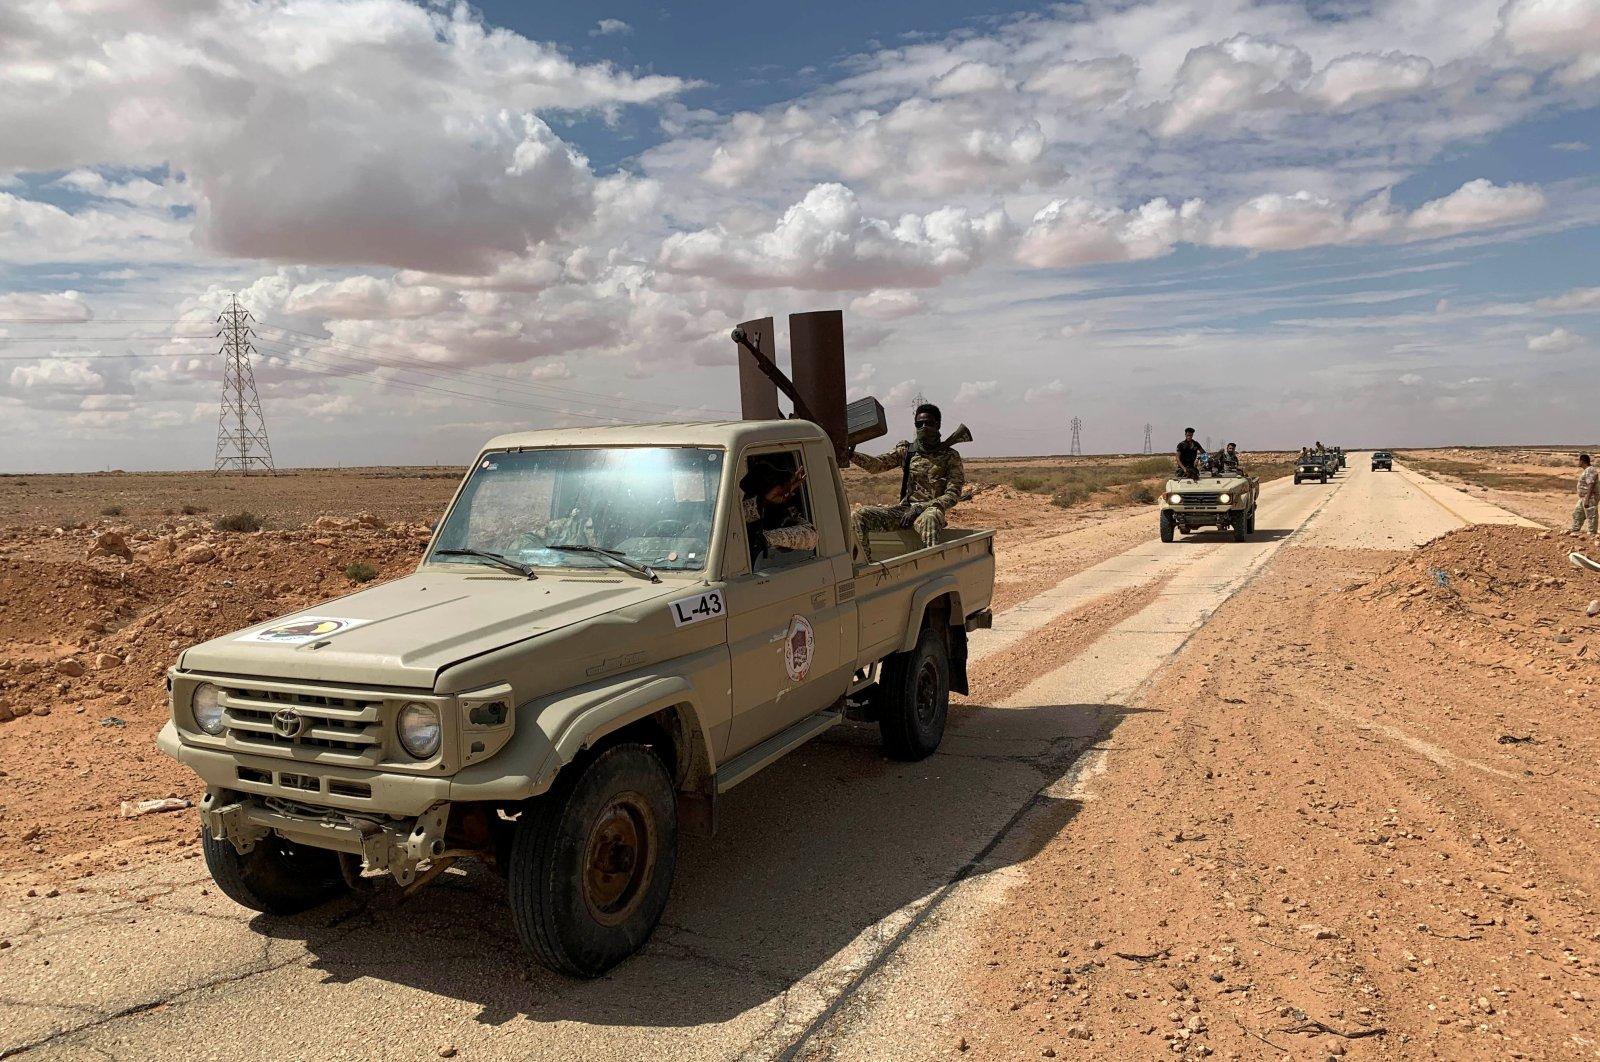 Troops loyal to Libya's internationally recognized government patrol the area in Zamzam, near Abu Qareen, Libya, Sept. 15, 2020. (Reuters Photo)